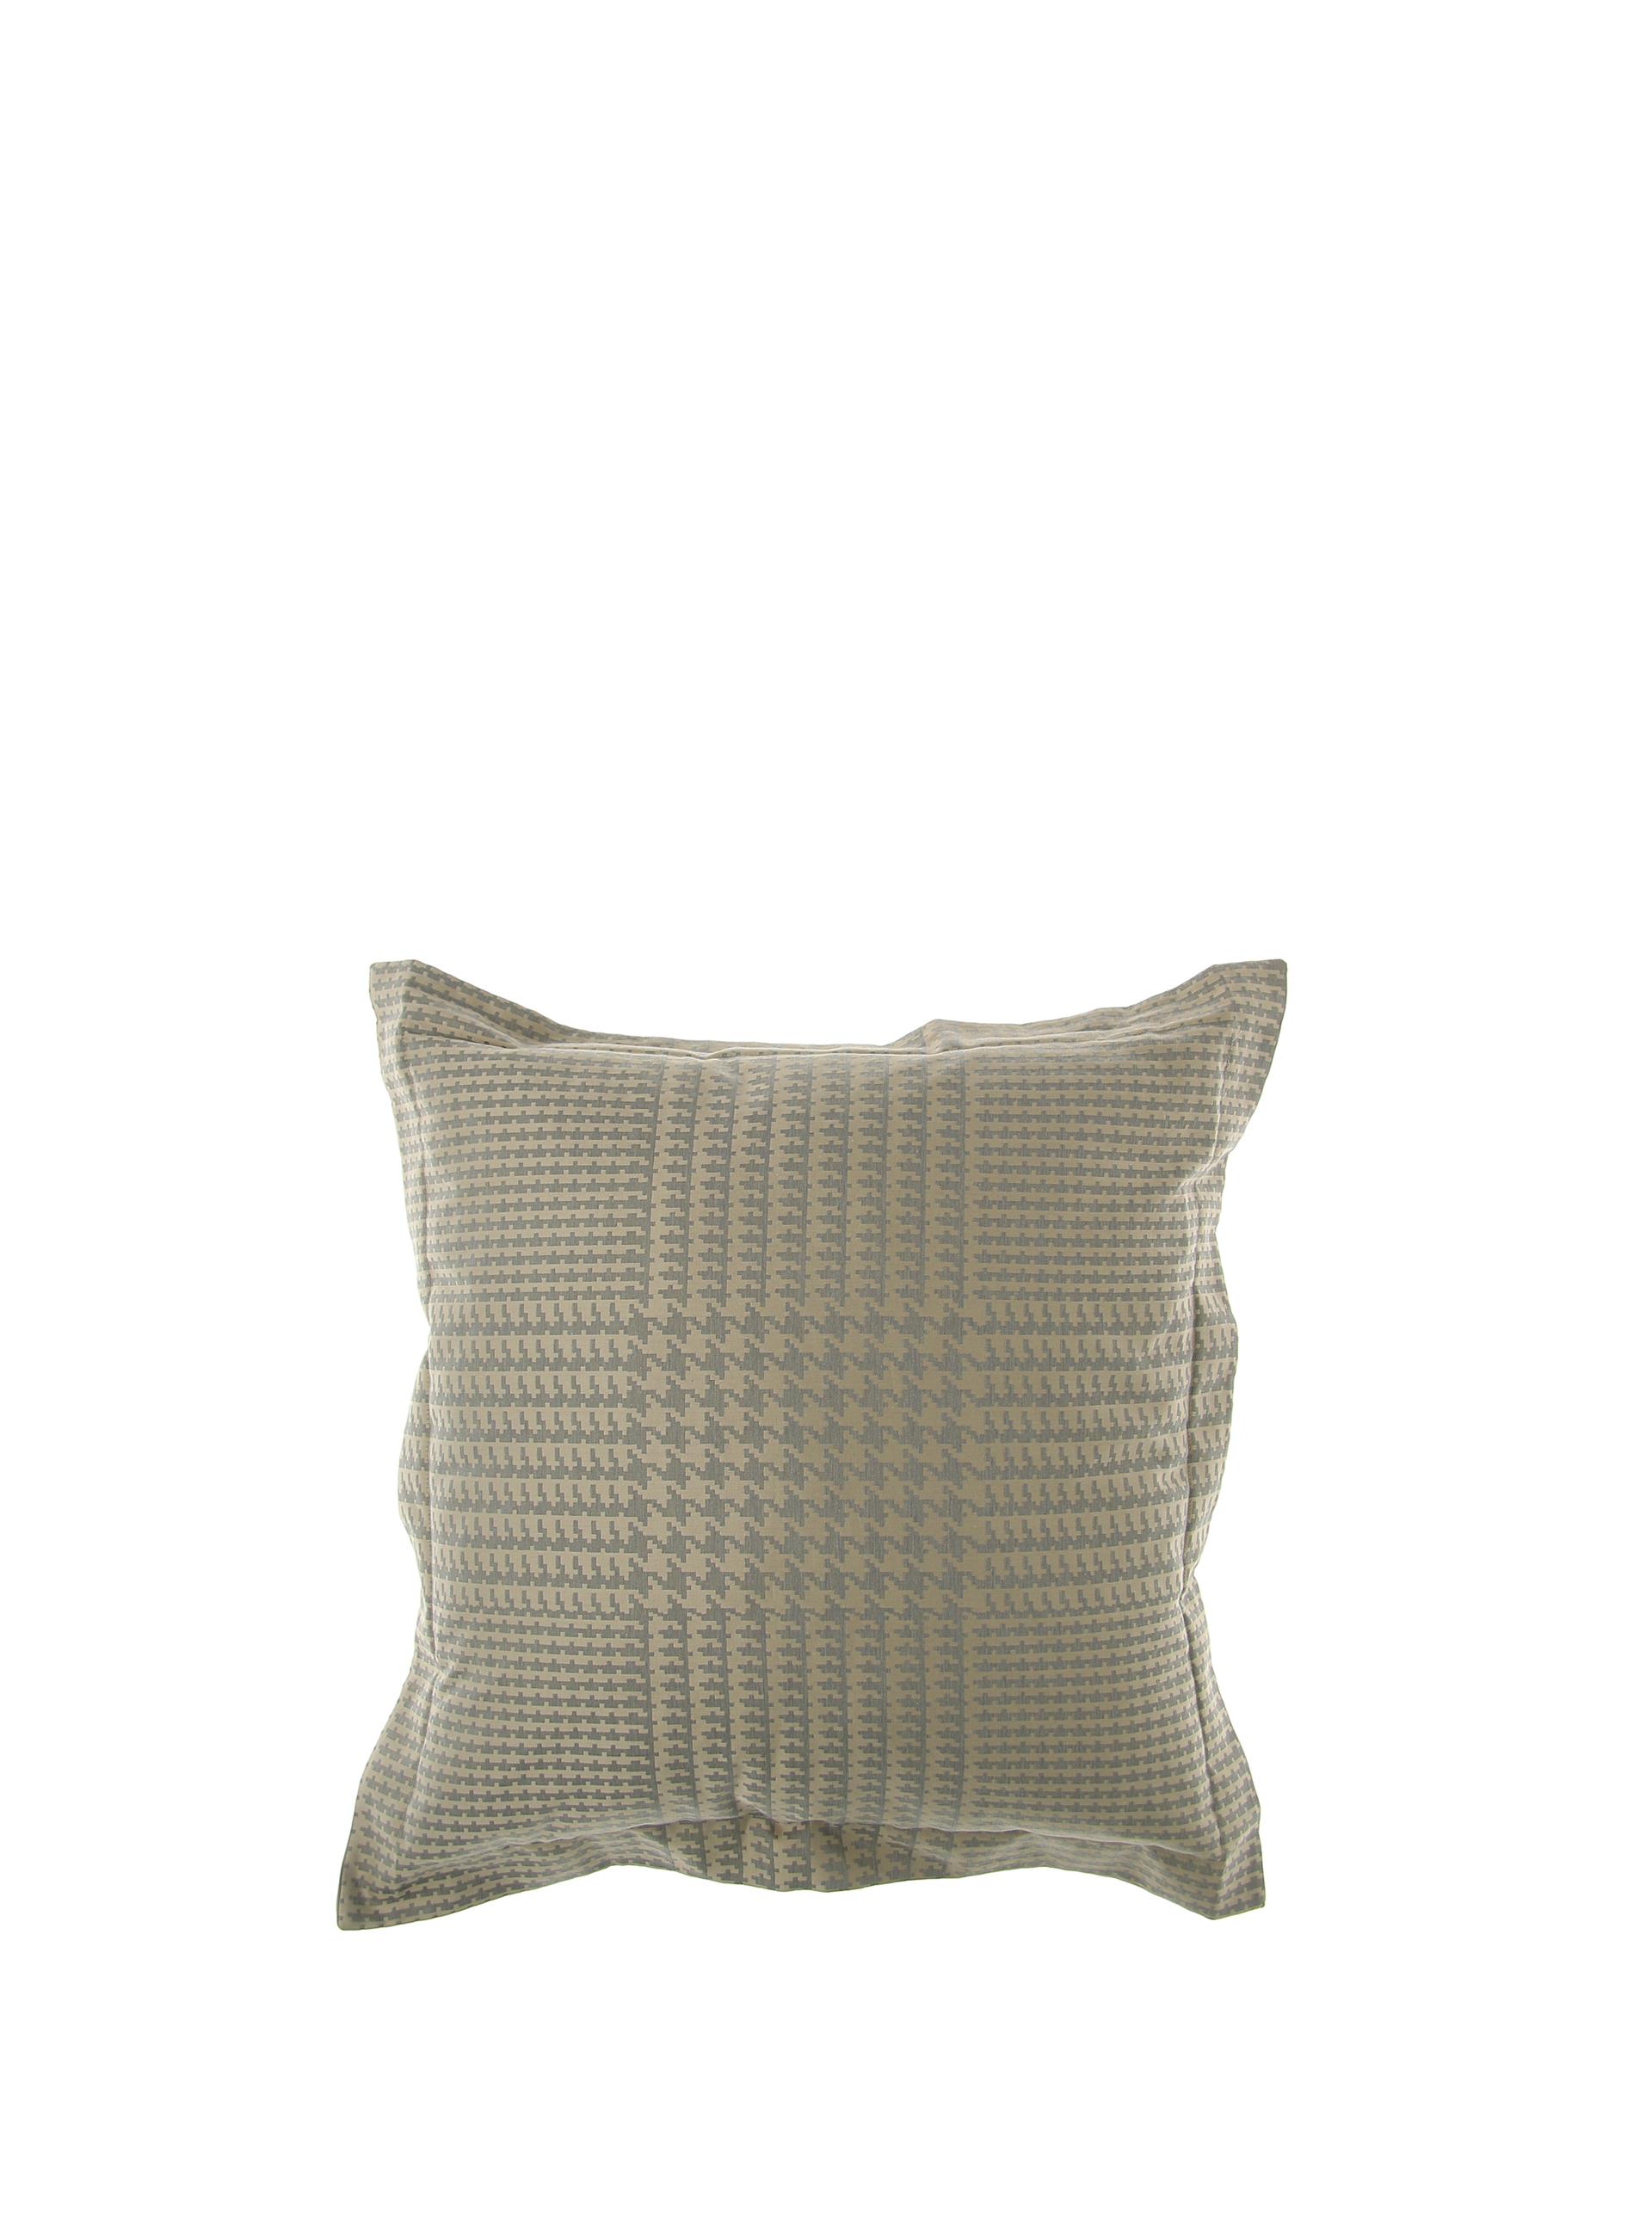 Mastro Raphael q16b1001 -10% pillows home cachi | Sorelle Ramonda